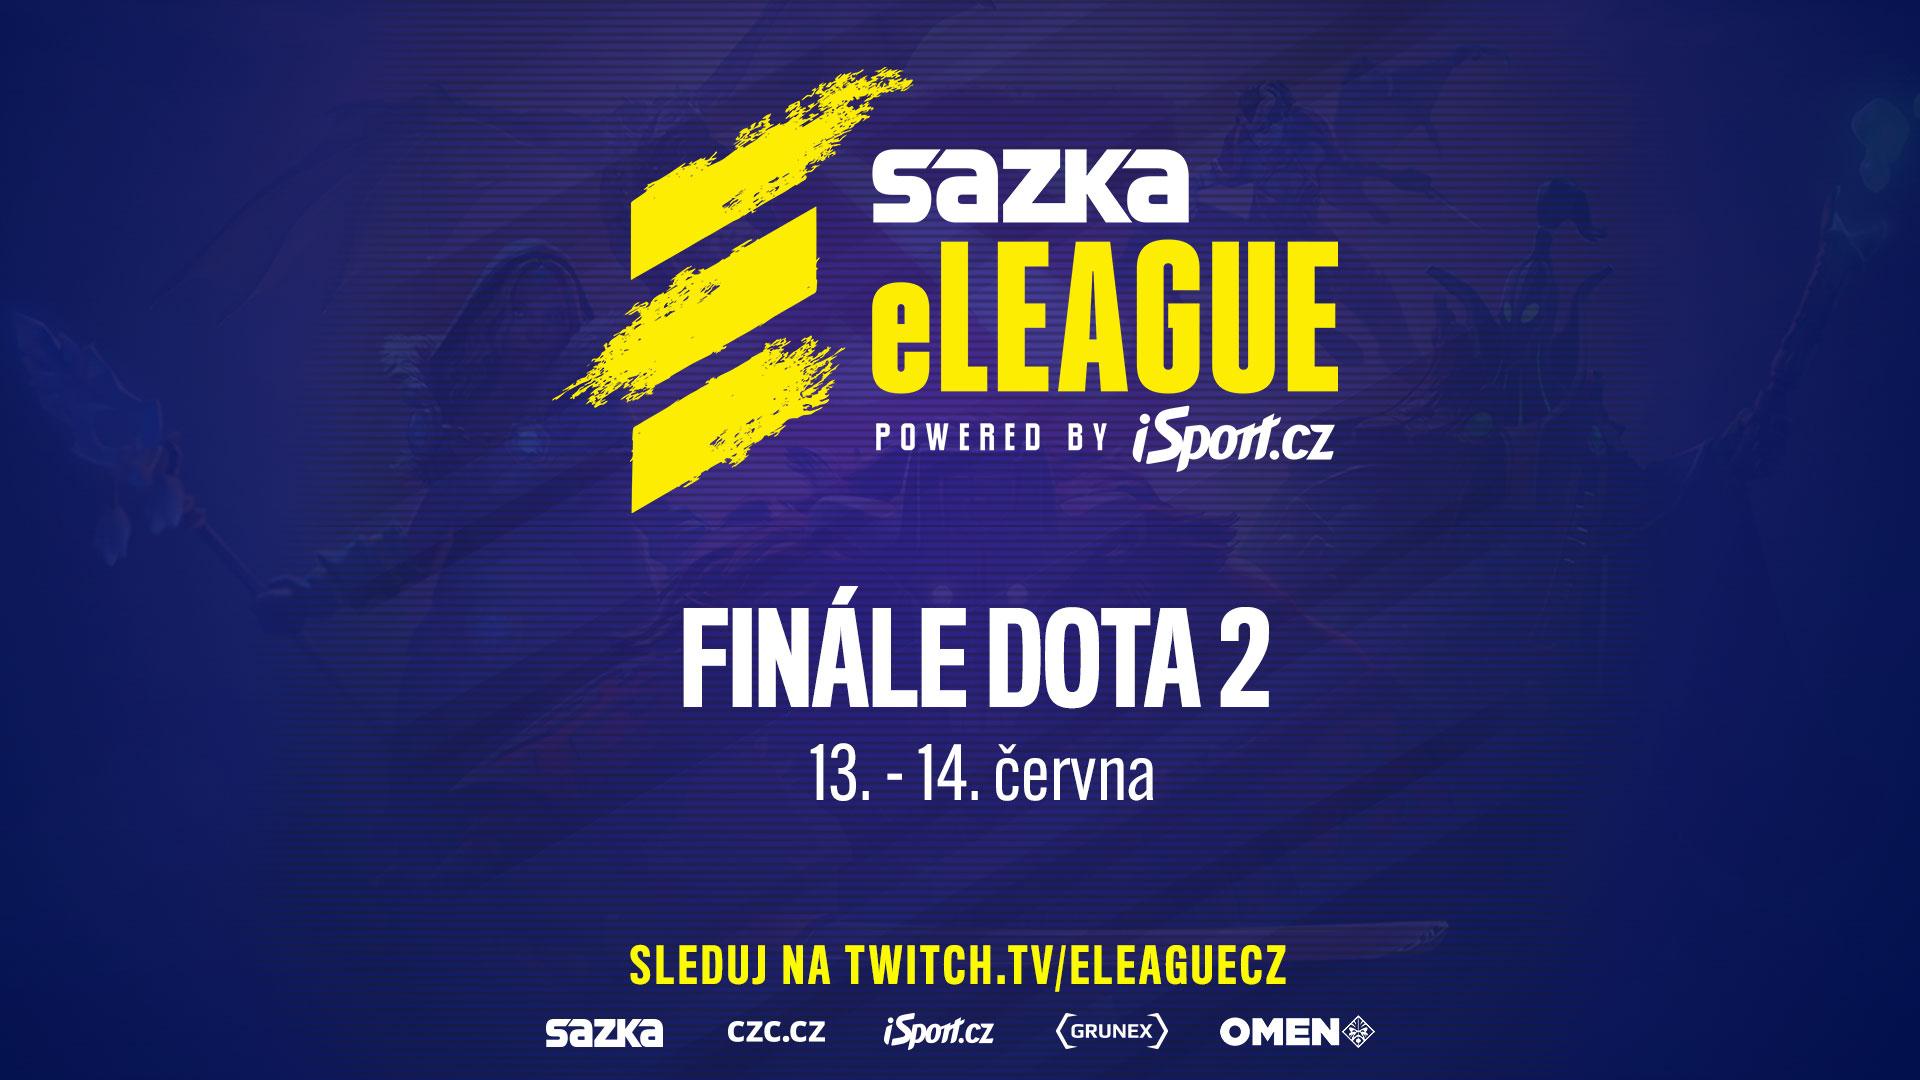 sazka-eleague_playoff_ilustrace2